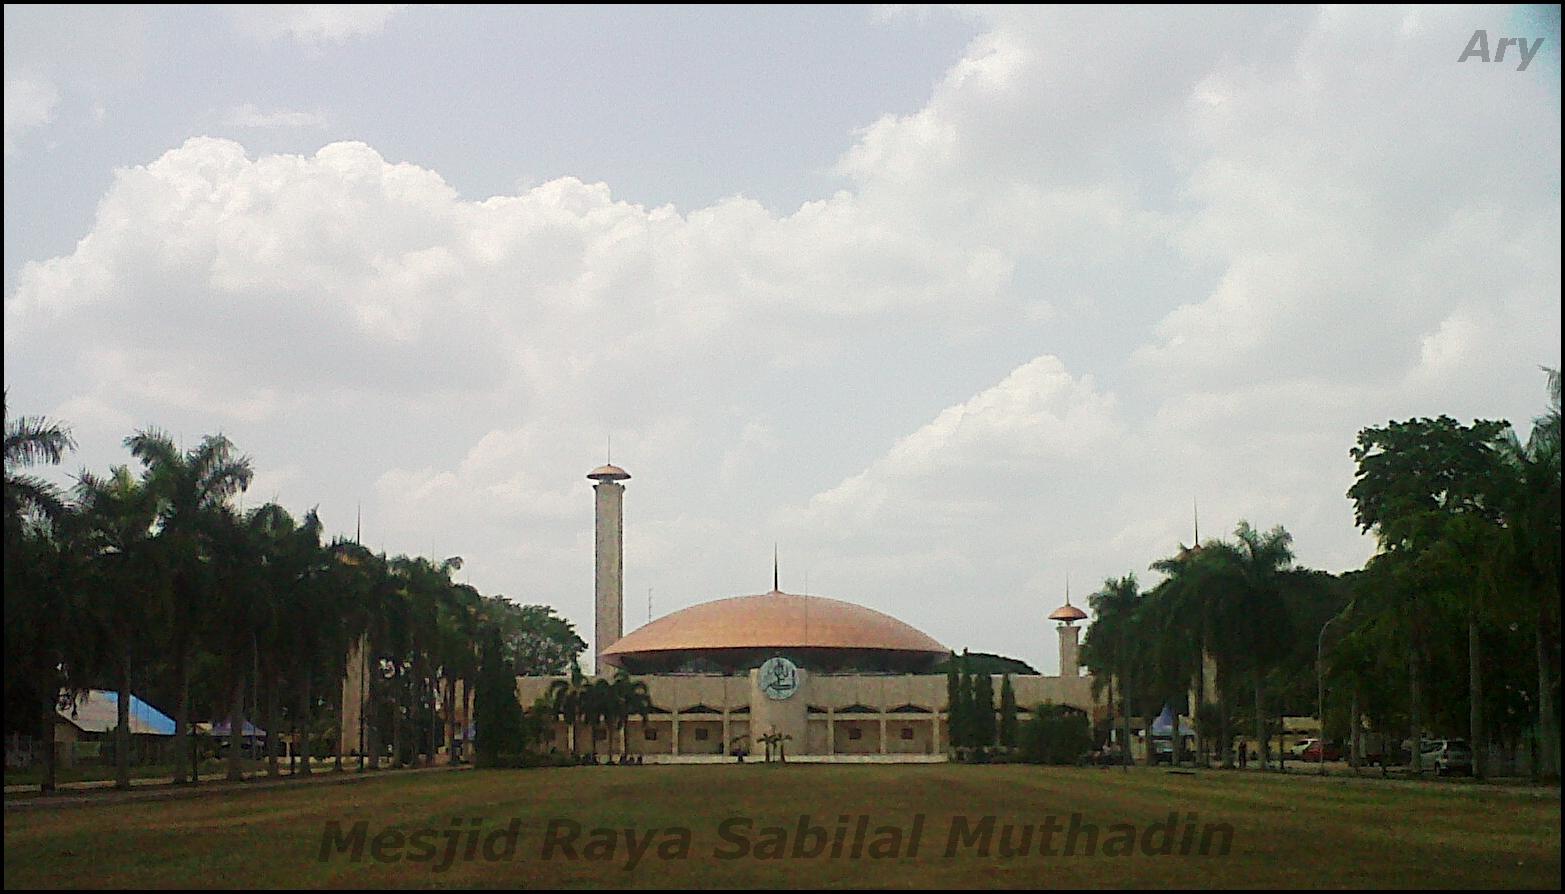 Pariwisata Kalimantan Selatan Sisi Terindah Mesjid Raya Sabilal Muhtadin Mungkin